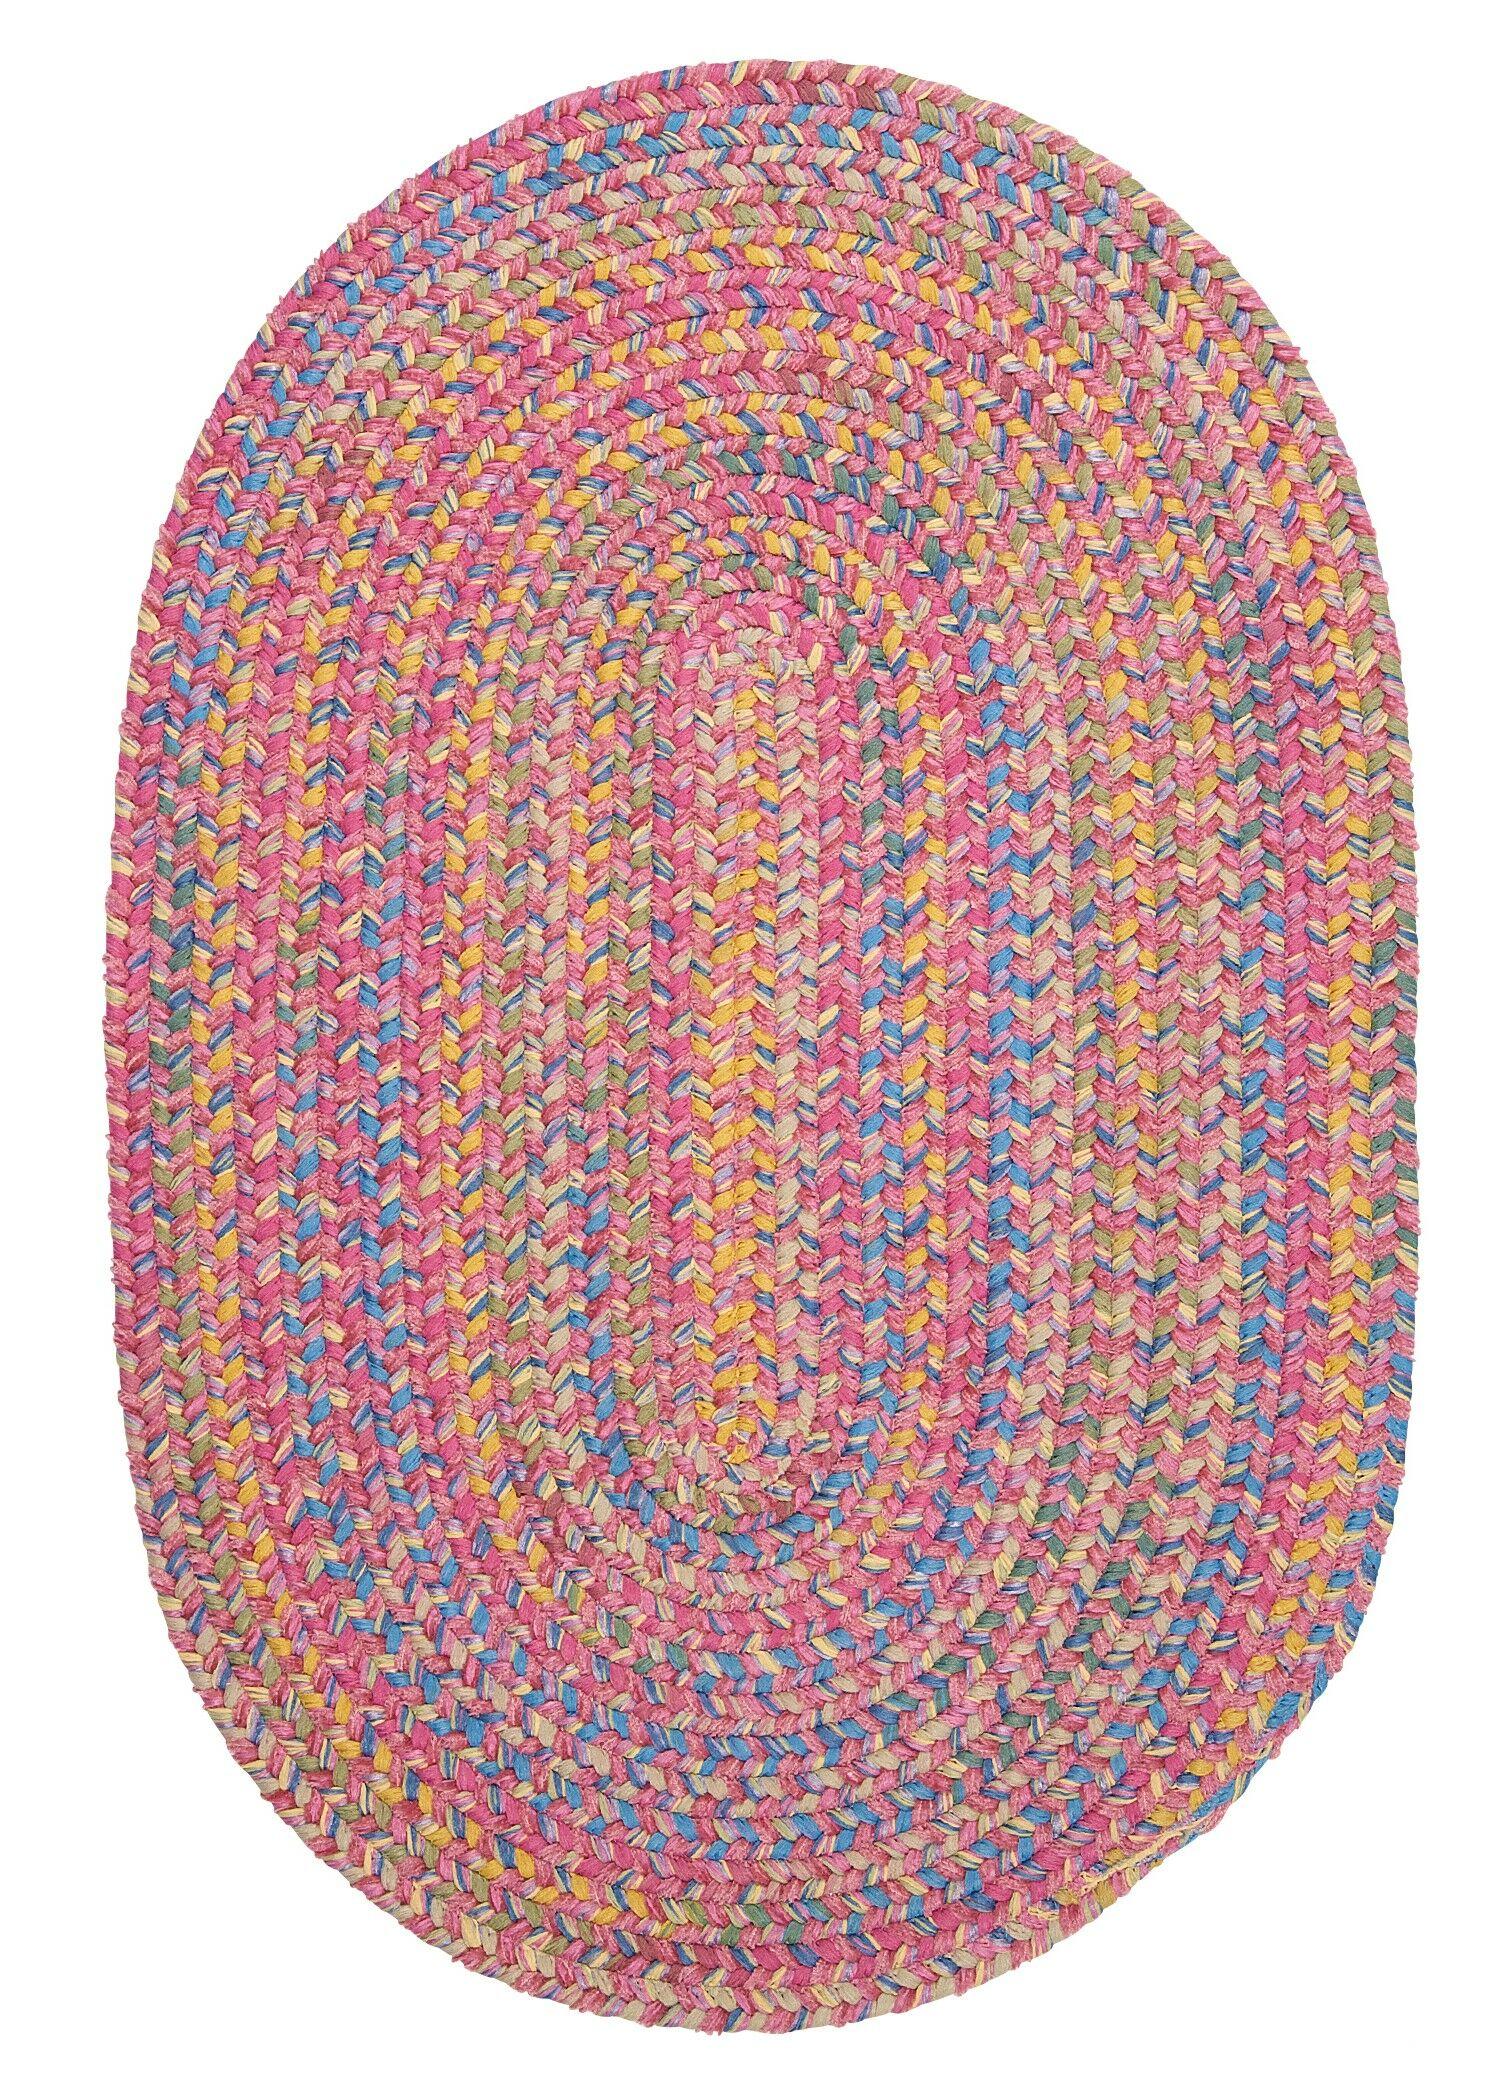 Oliver Reversible Area Rug Rug Size: Round 12'